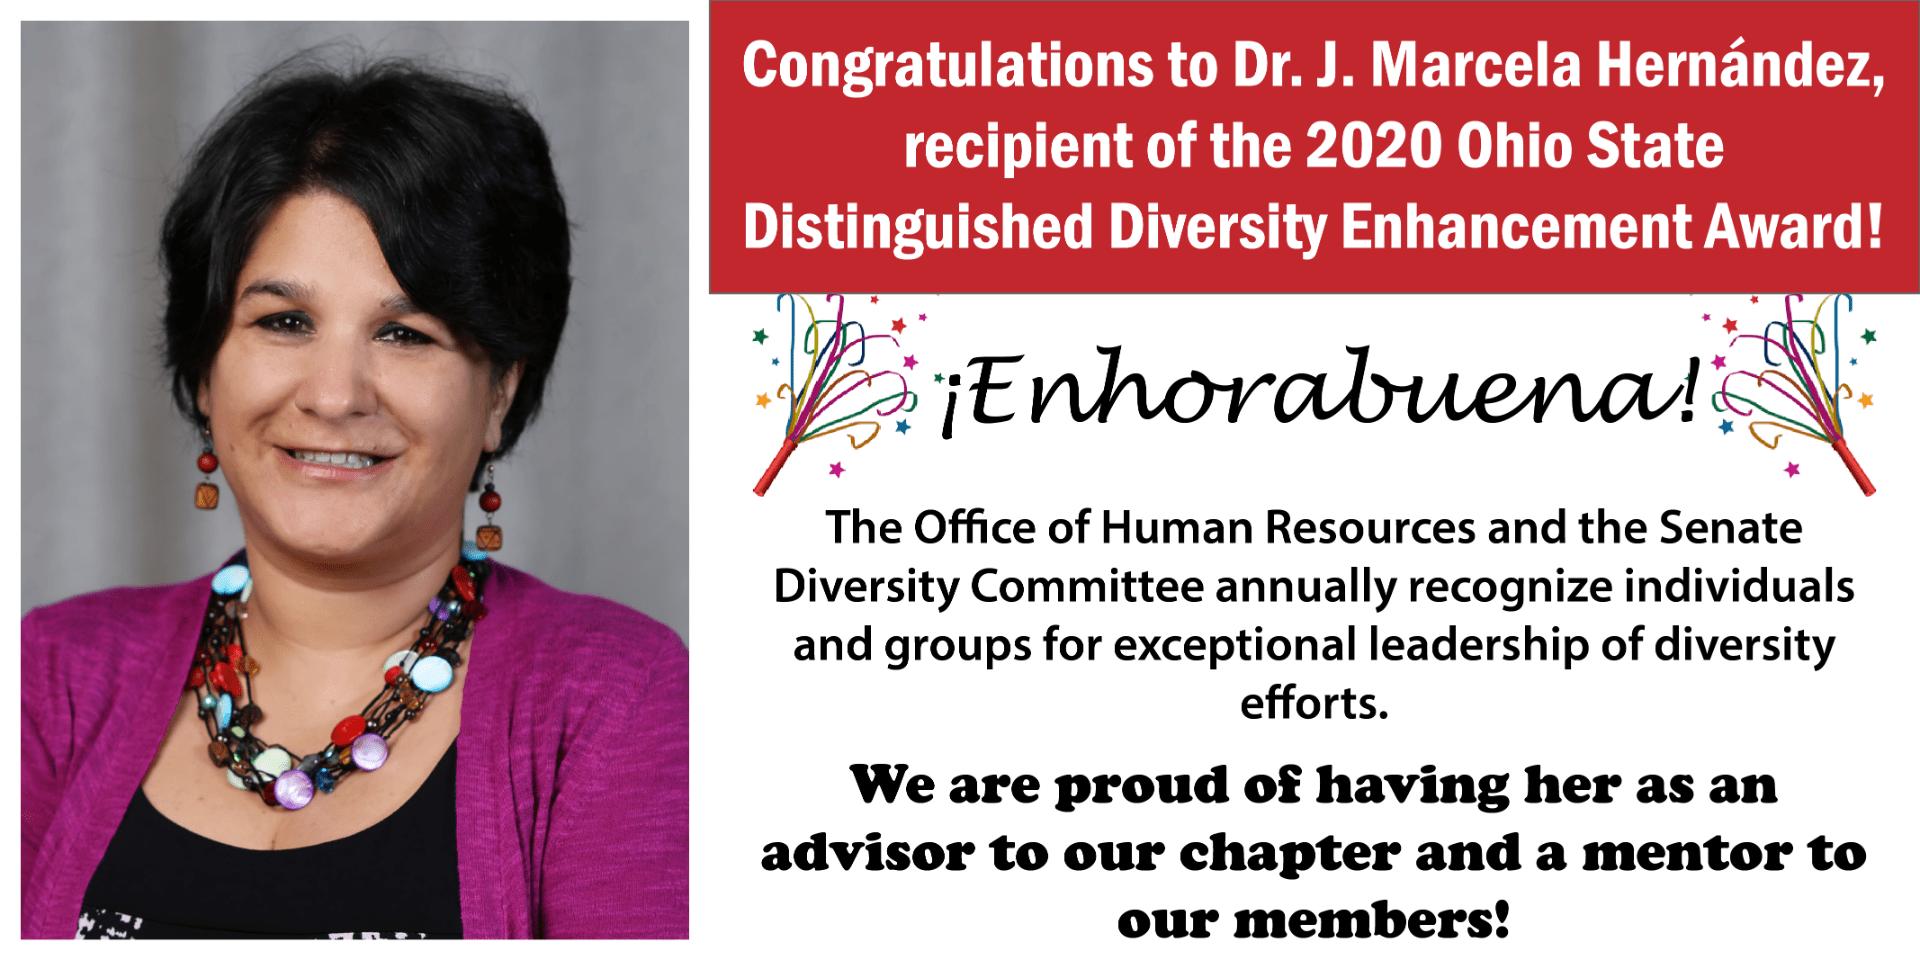 Dr. J. Marcela Hernandez won the 2020 Ohio State Distinguished Diversity Enhancement Award